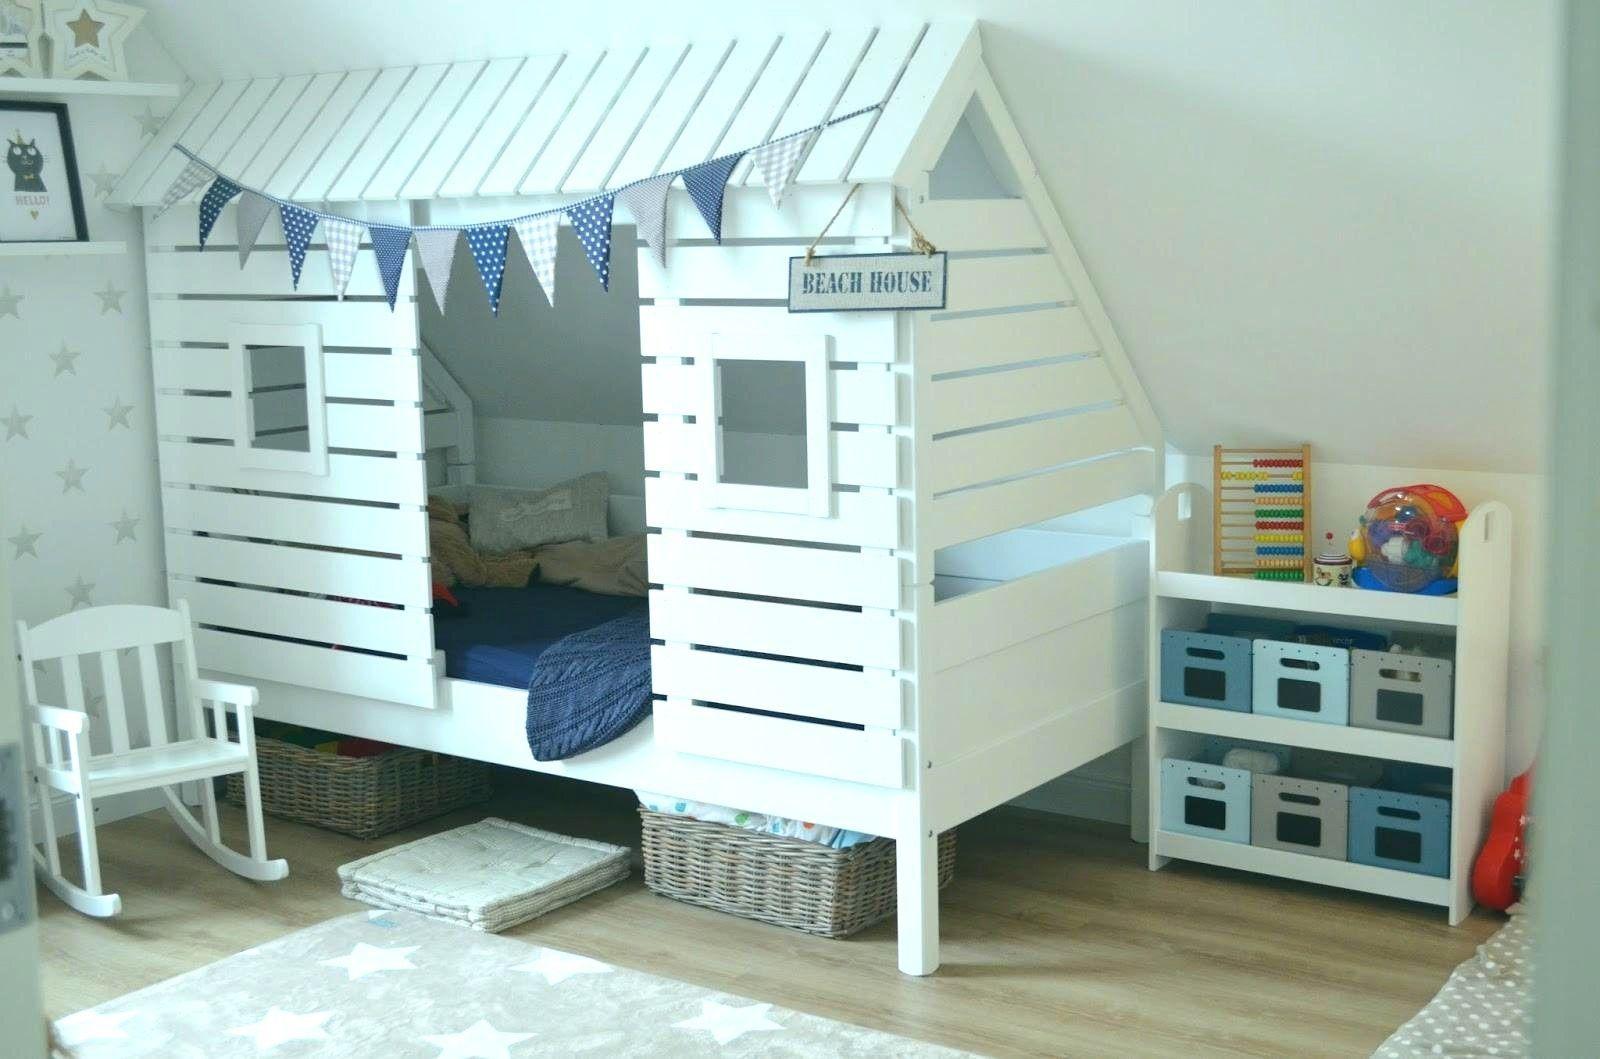 Kinderzimmer Junge 6 Jahre In 2020 Boy Room Childrens Room Boys Small Kids Room